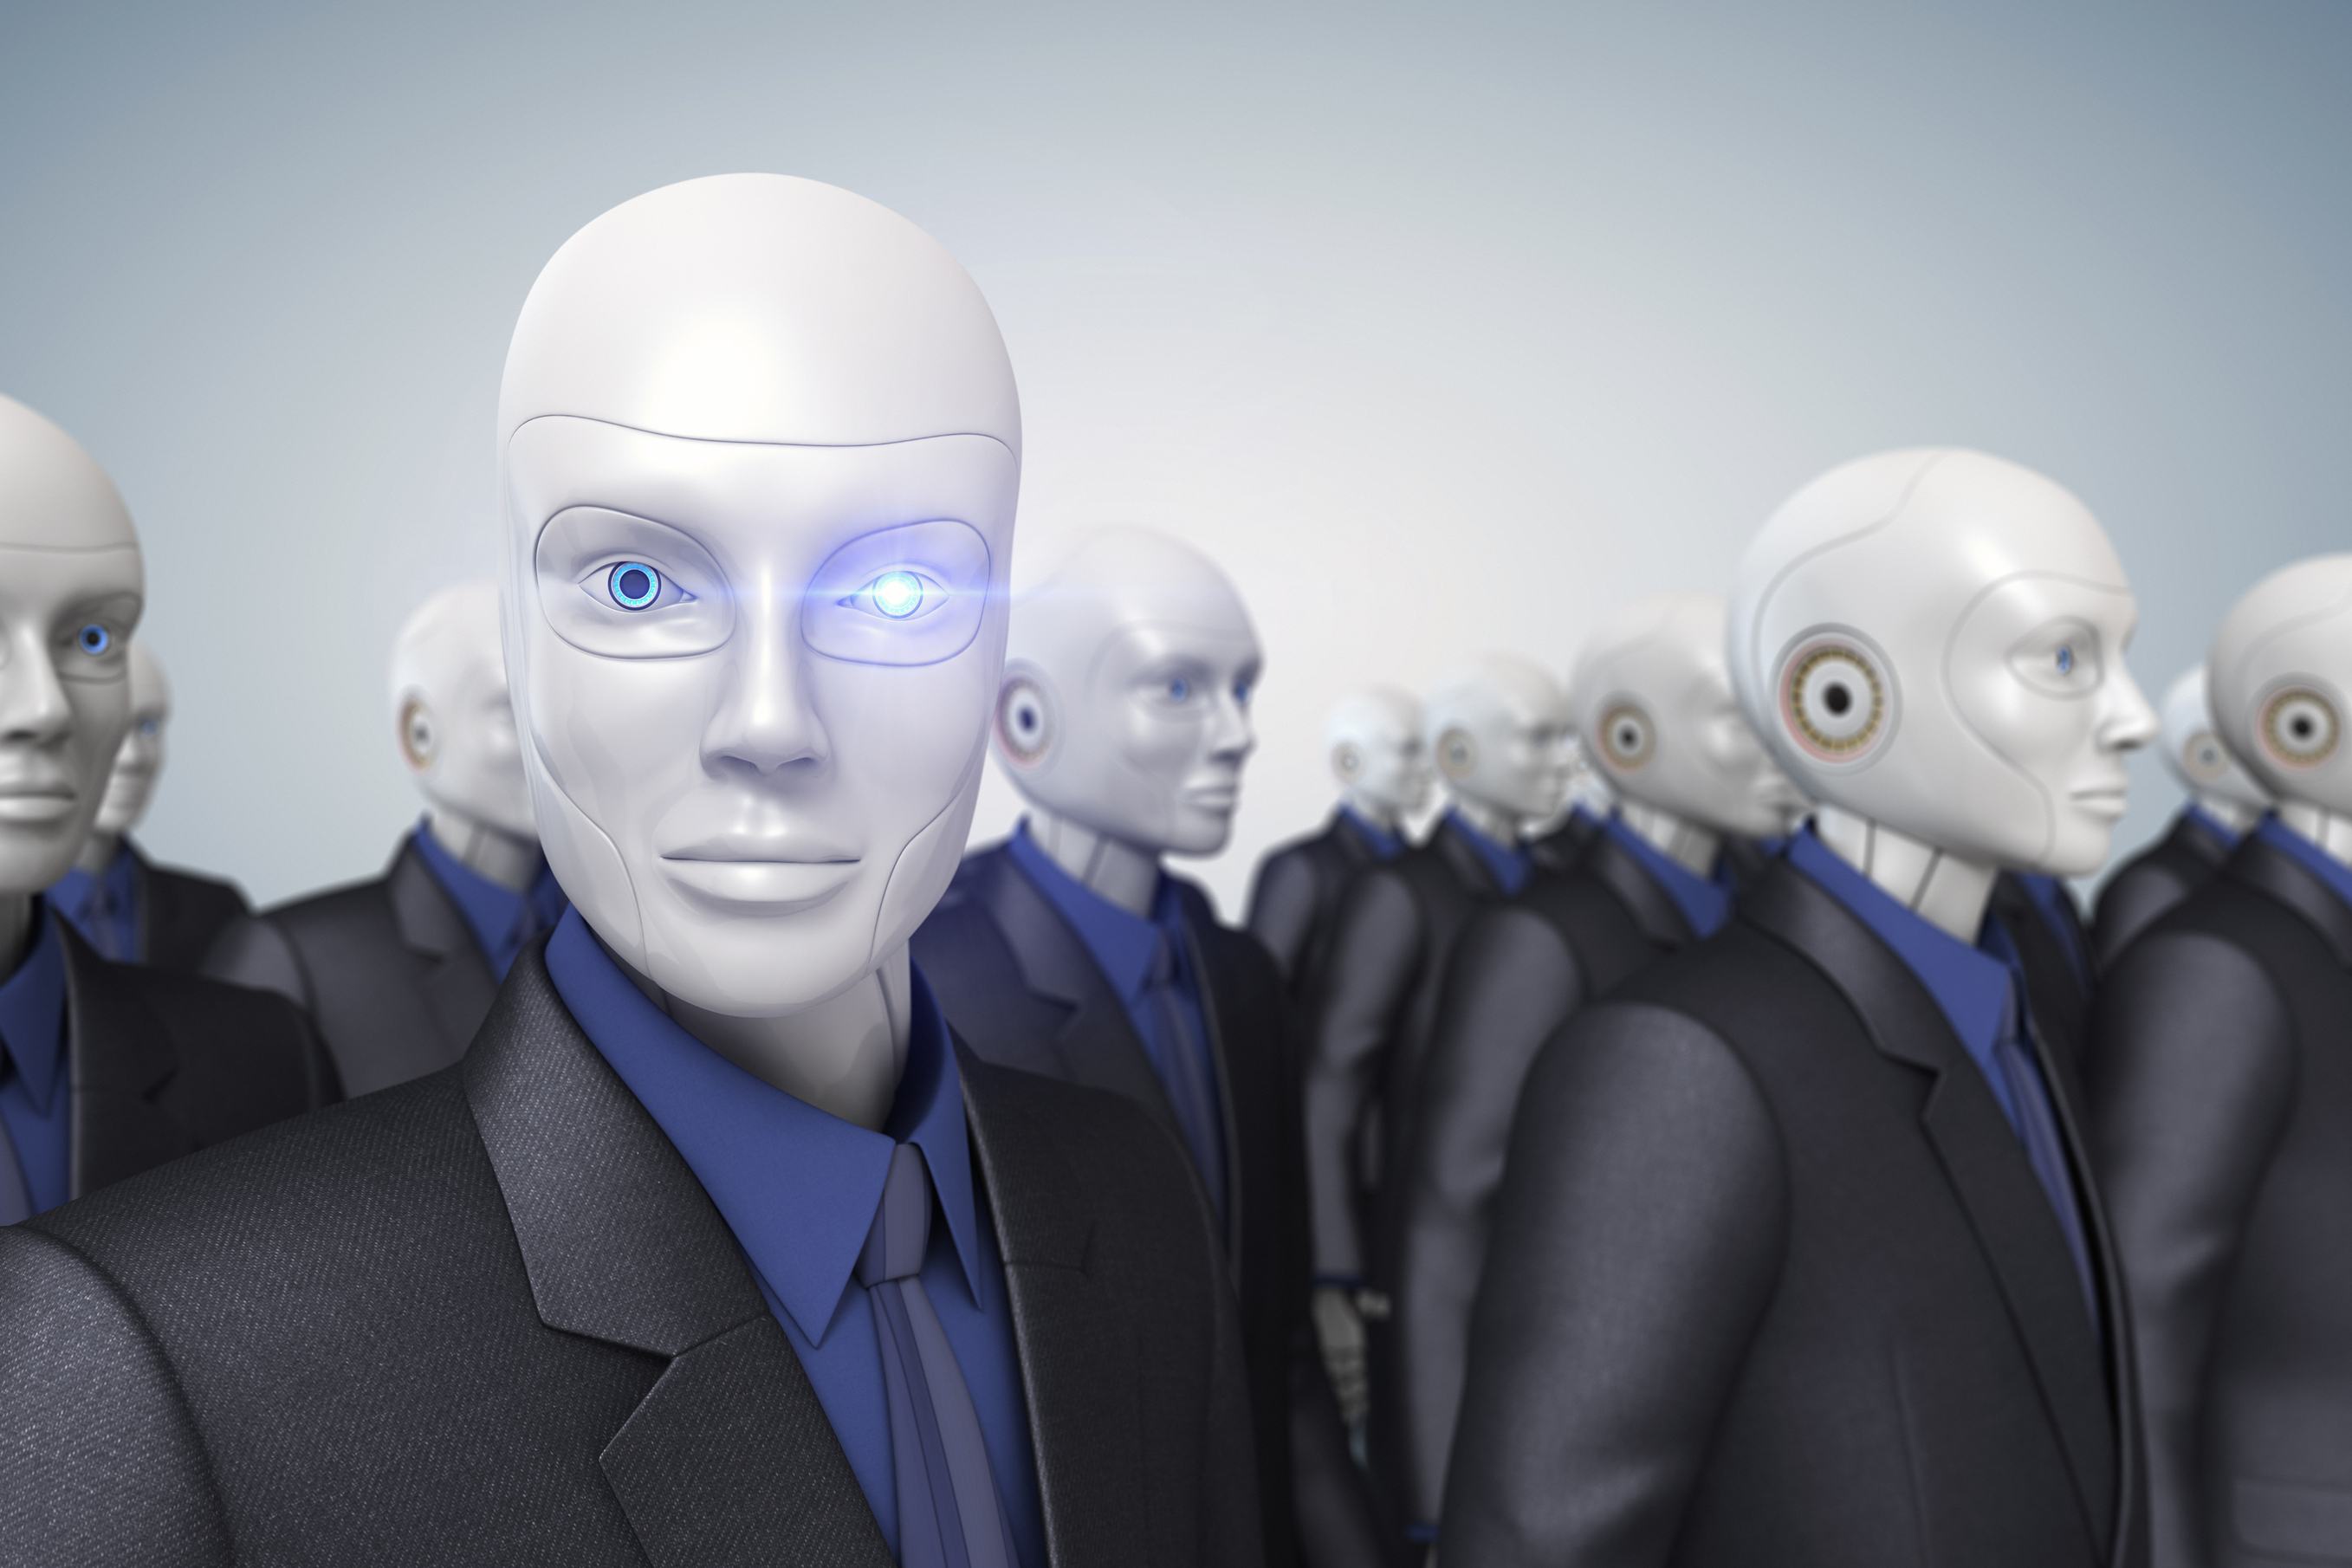 Robot, AI, cyber, artificial intelligence